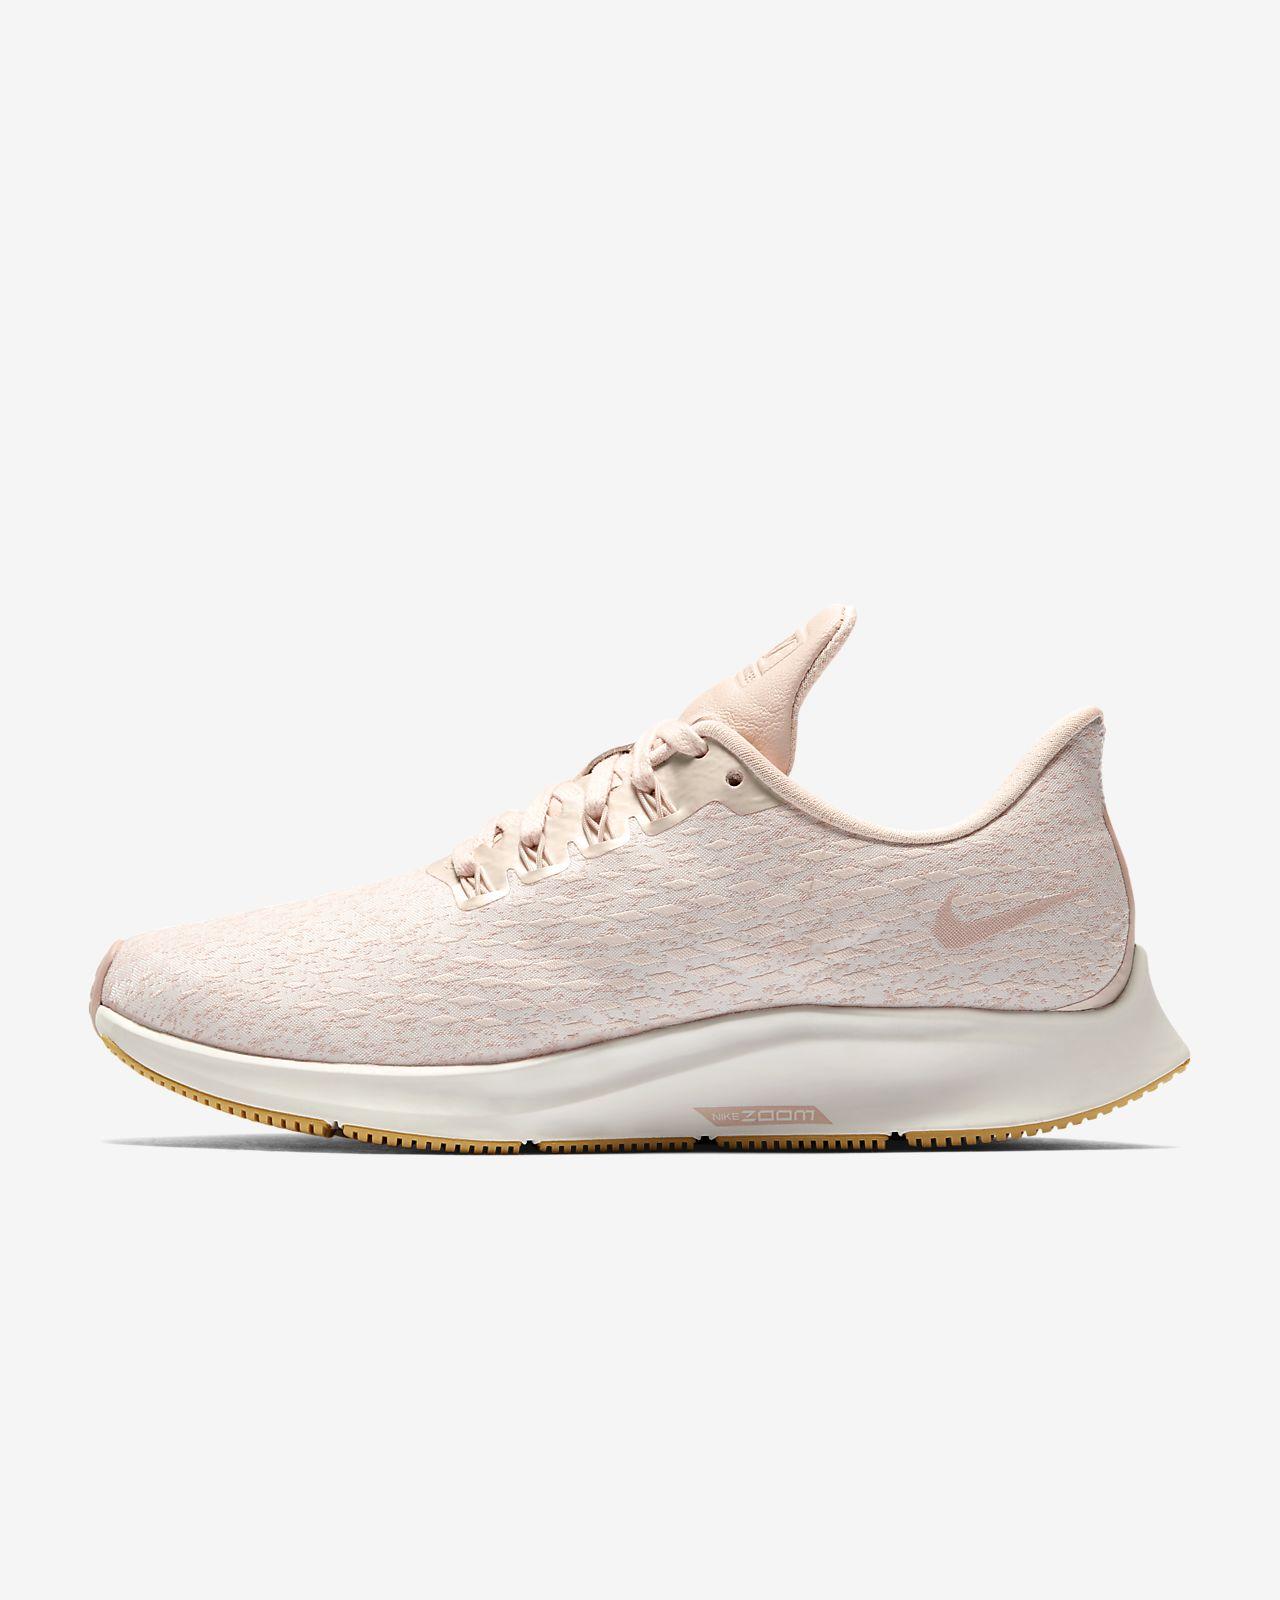 Nike Pegasus Zoom Air Pour Femme Chaussure Premium De Running 35 qXxfFwqOr